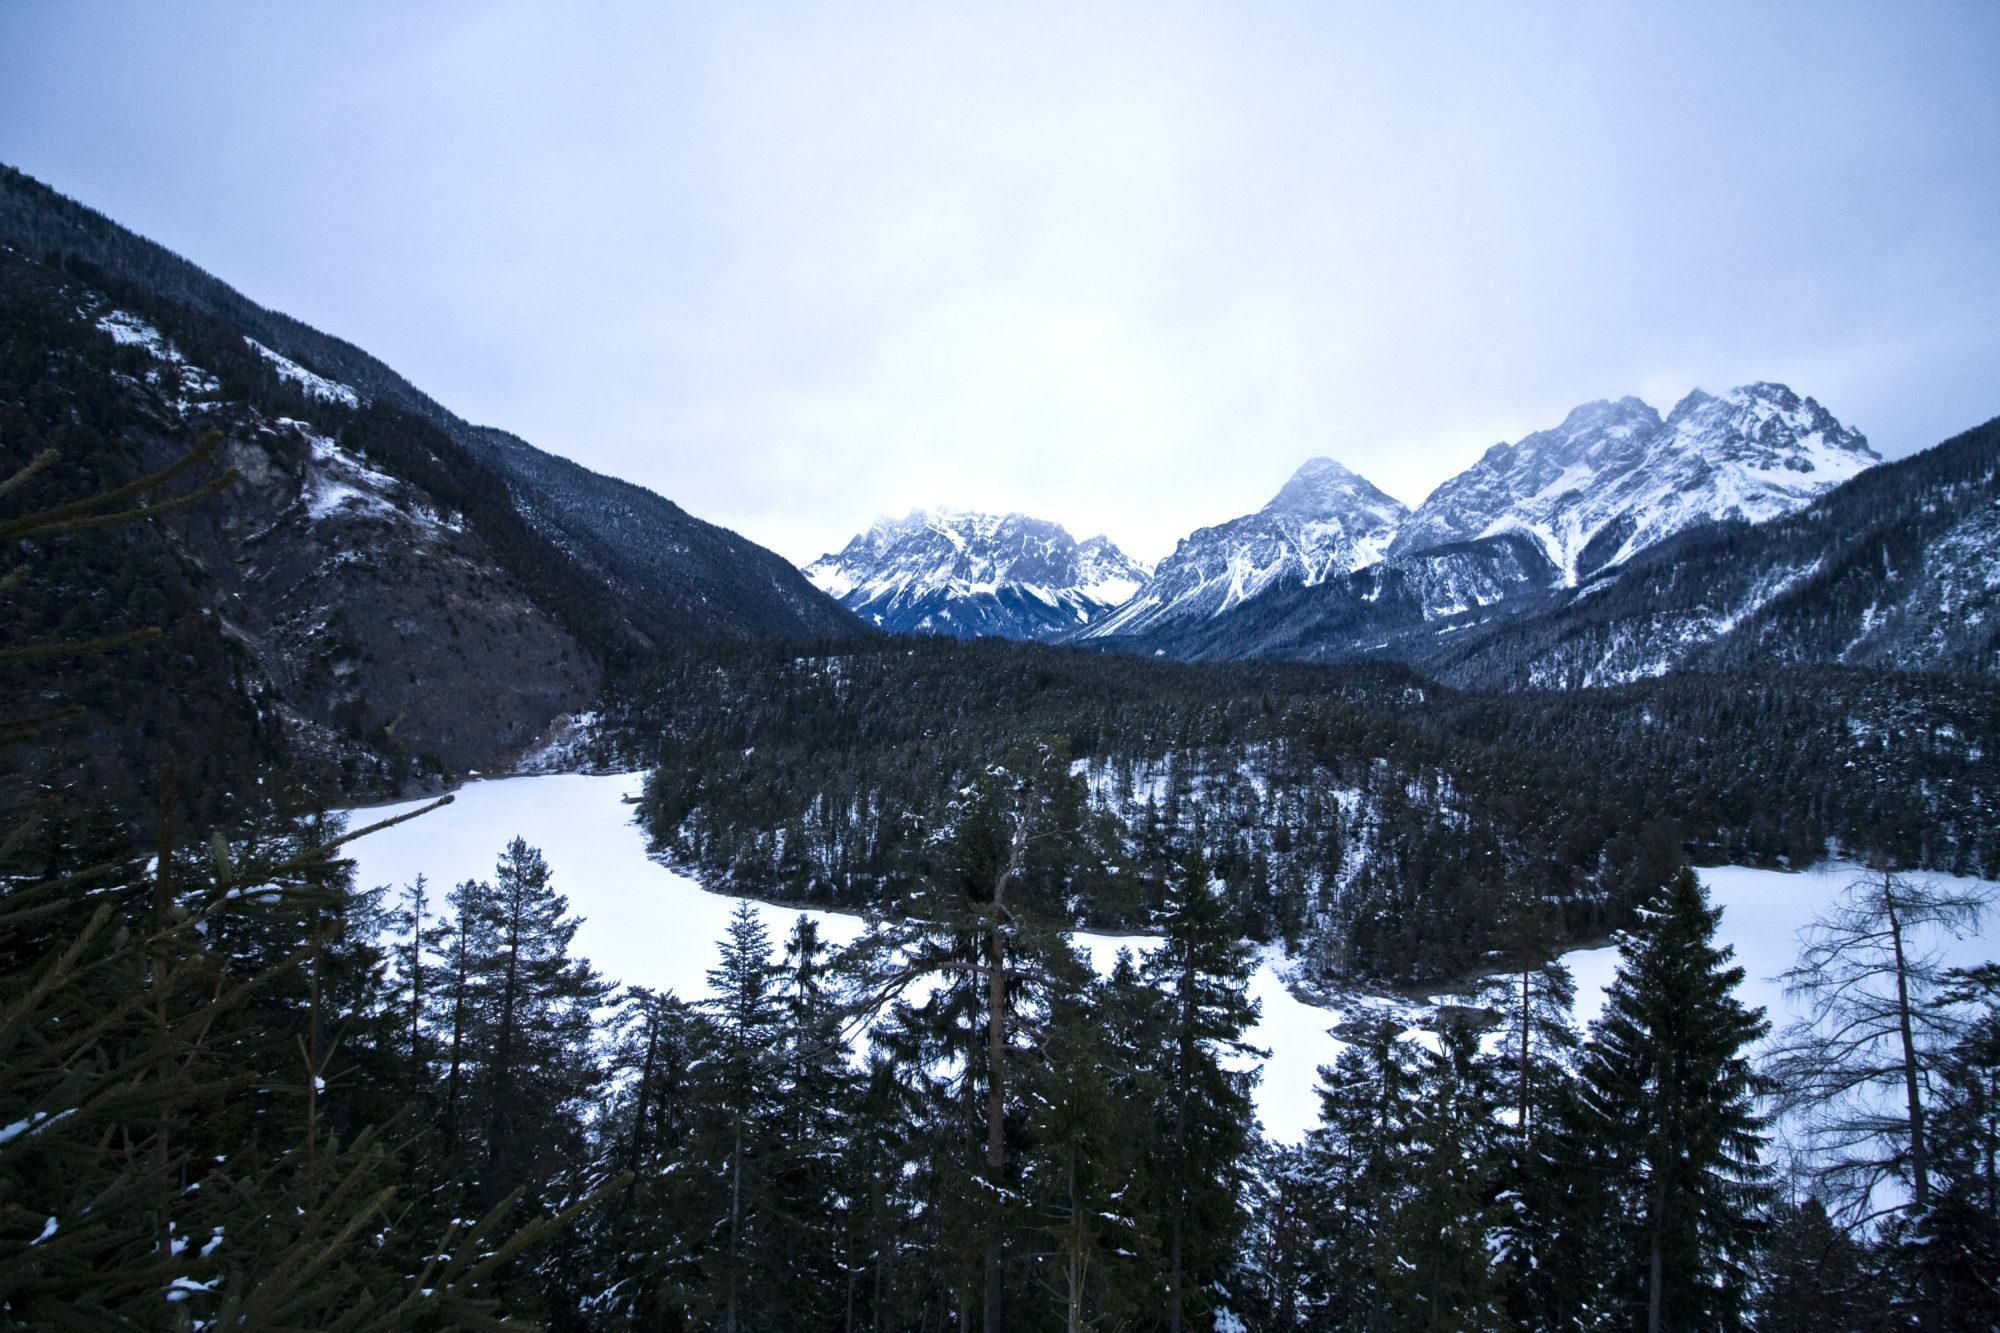 Alps near the Austria/Germany border